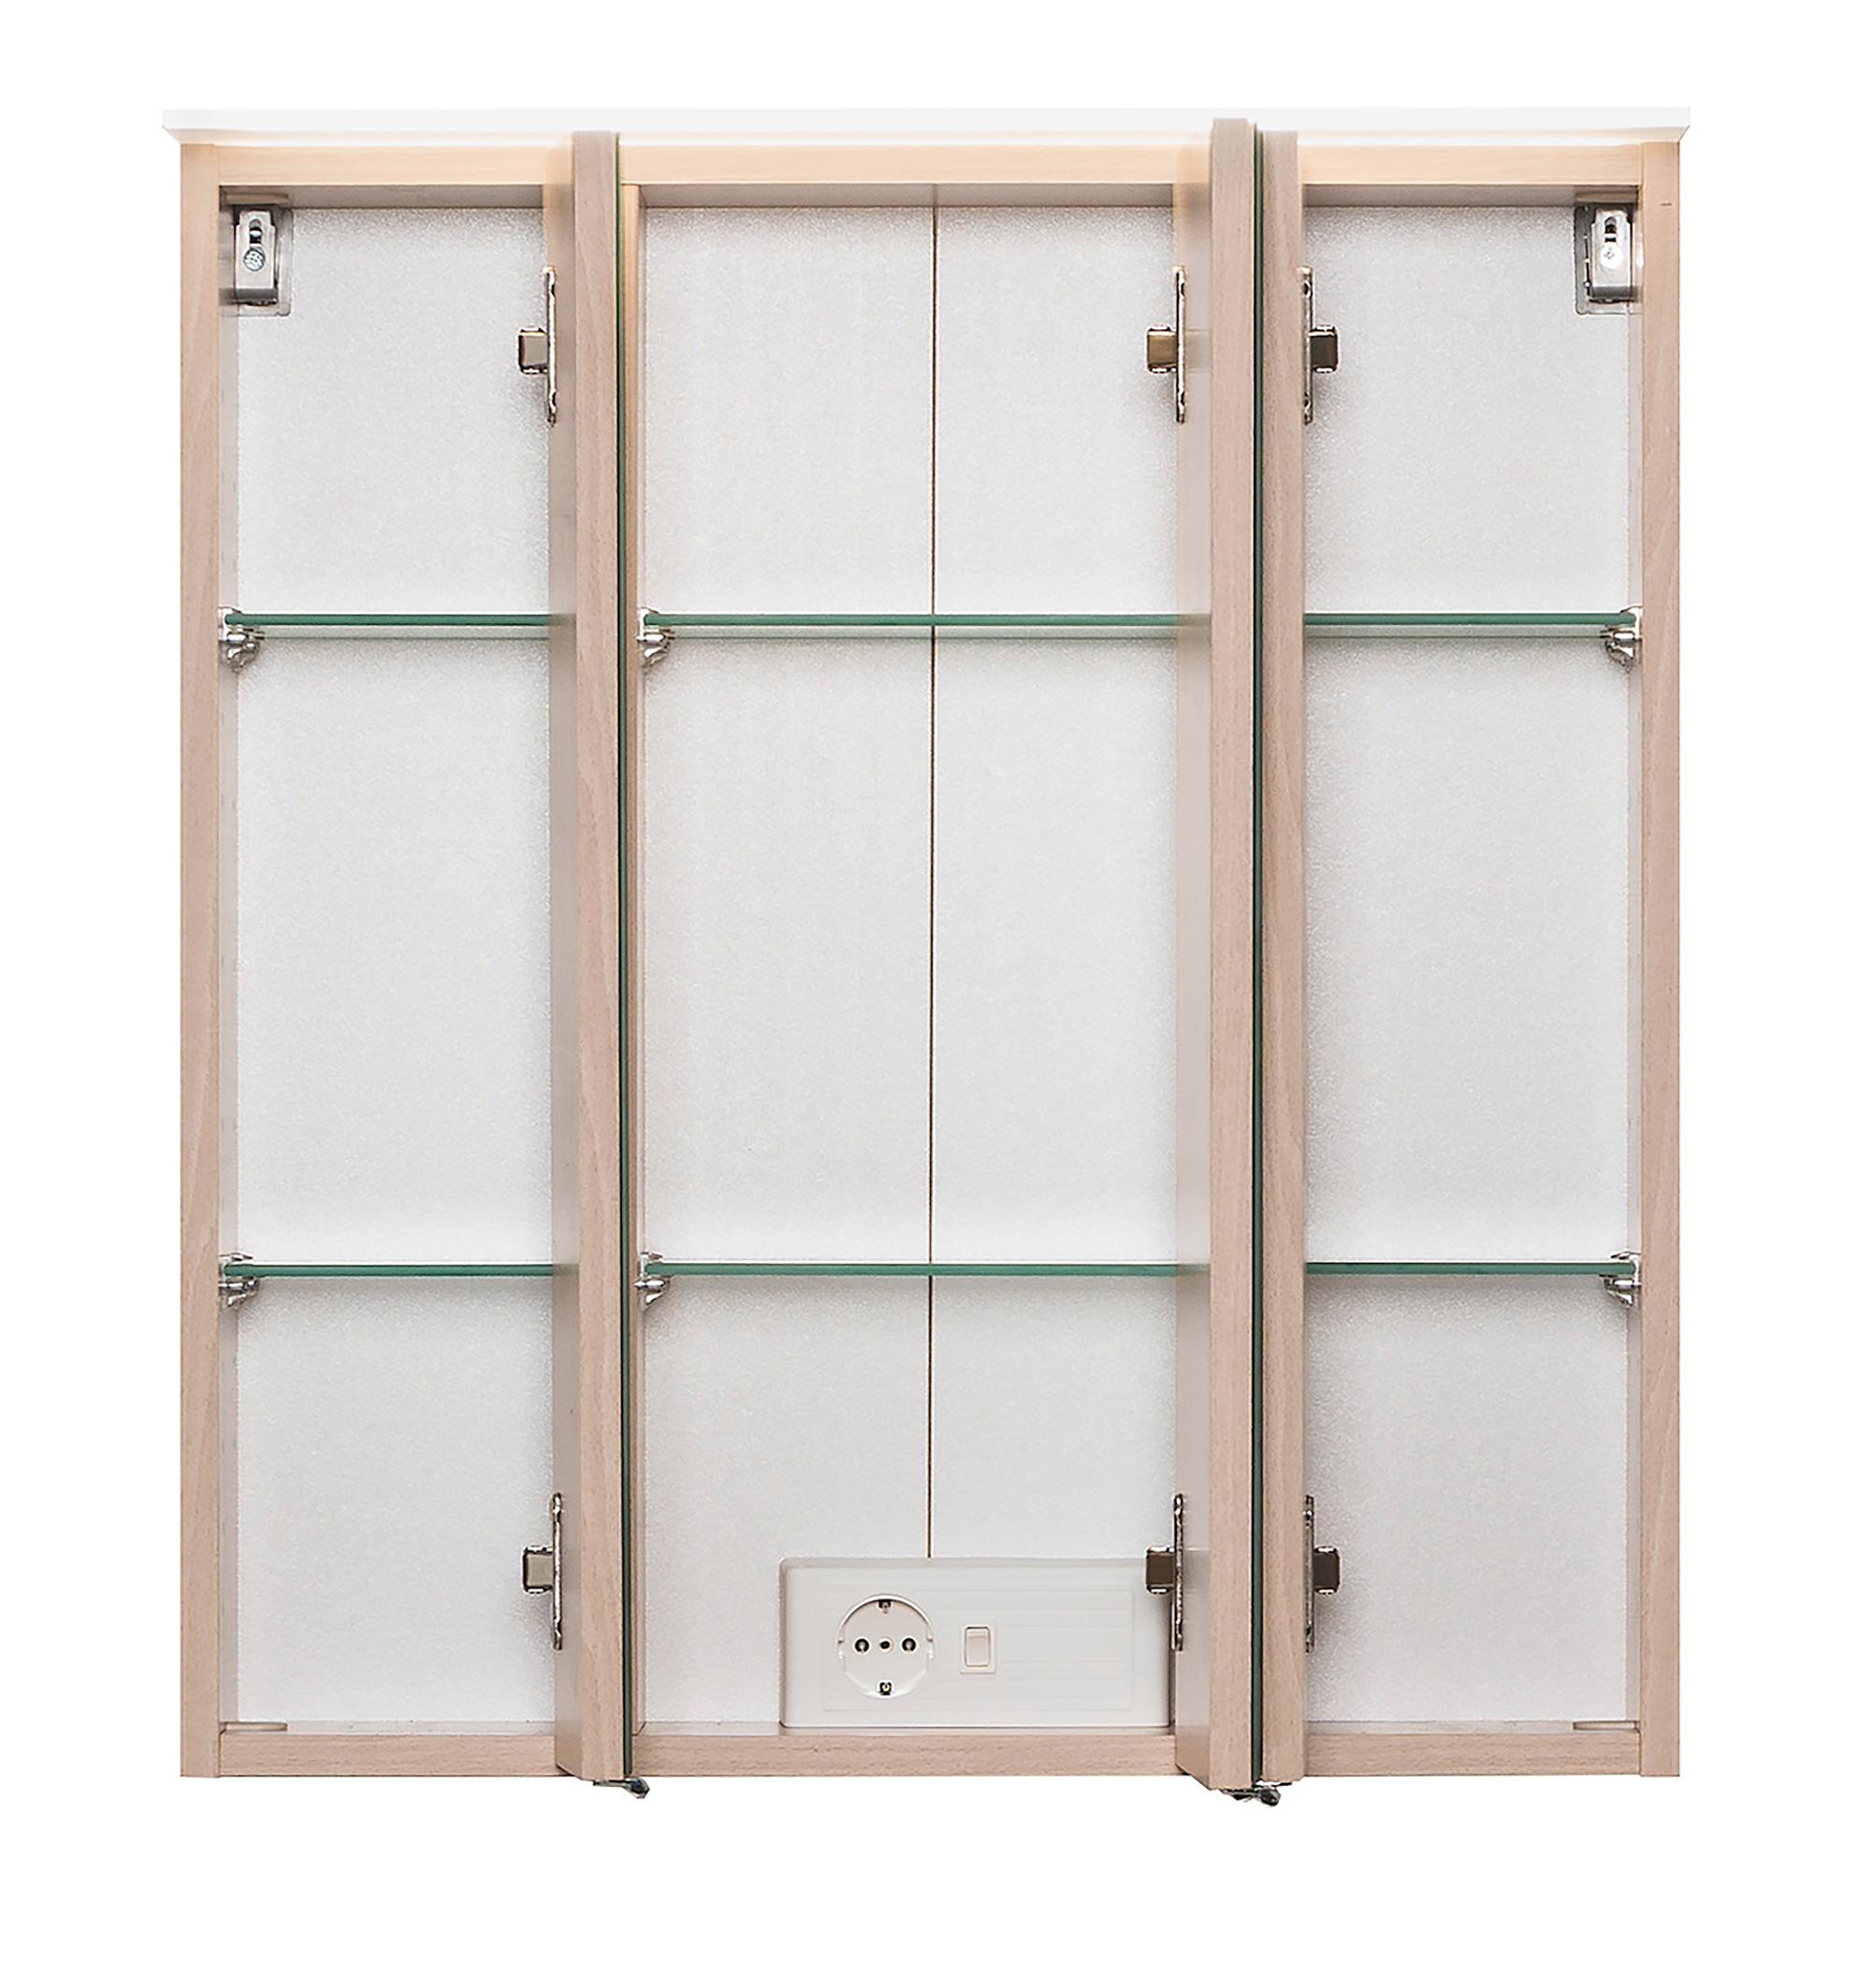 badm bel set ravello mit keramikbecken 4 teilig 60 cm breit buche bad badm belsets. Black Bedroom Furniture Sets. Home Design Ideas